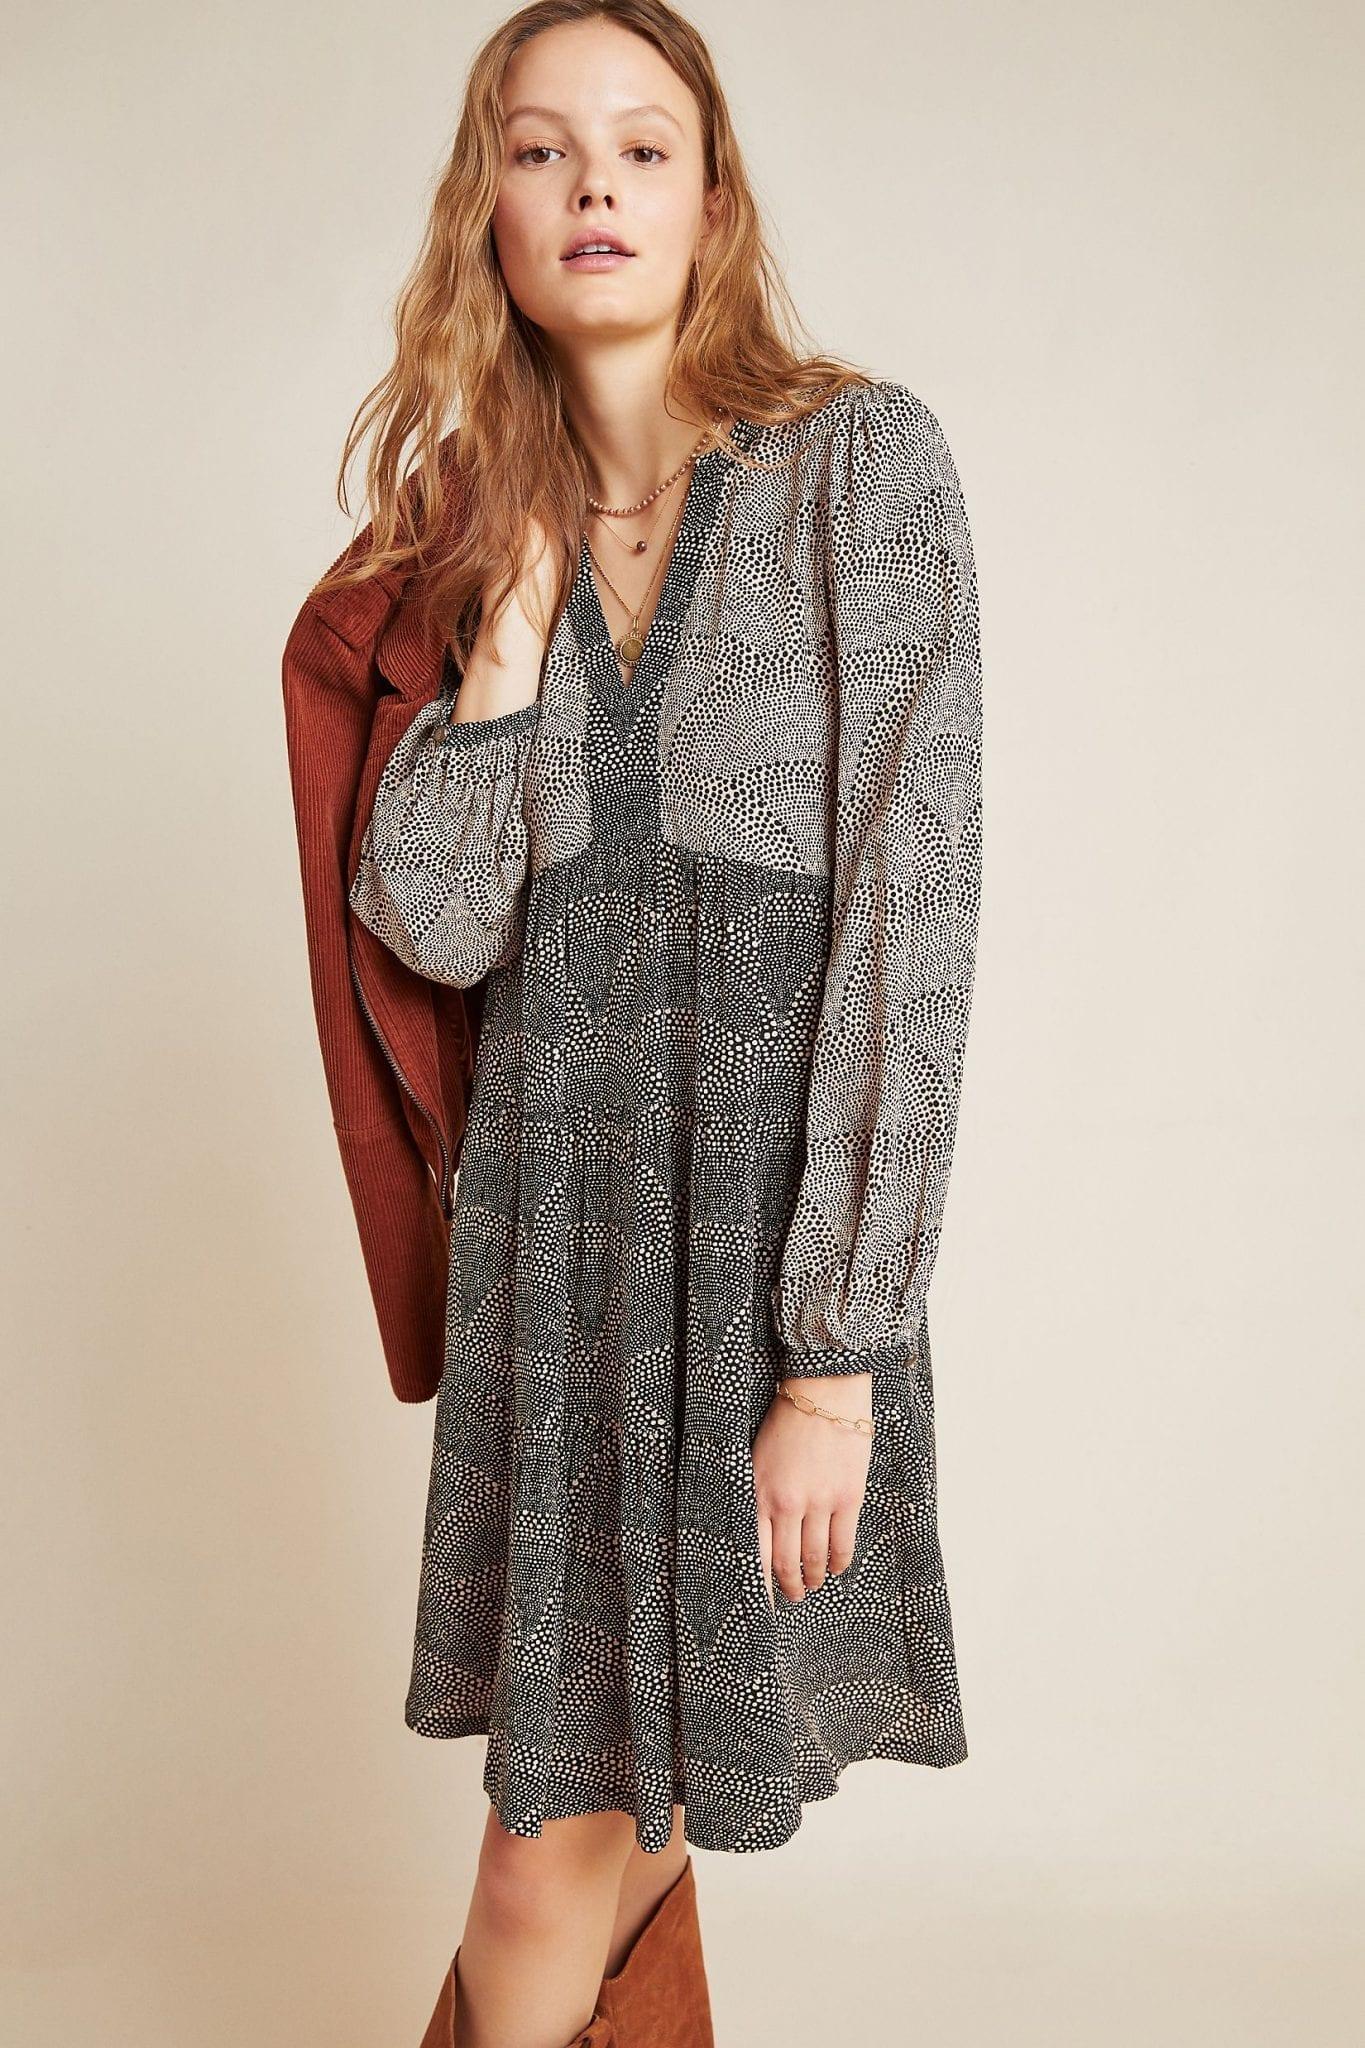 MAEVE Amber Tiered Tunic Dress